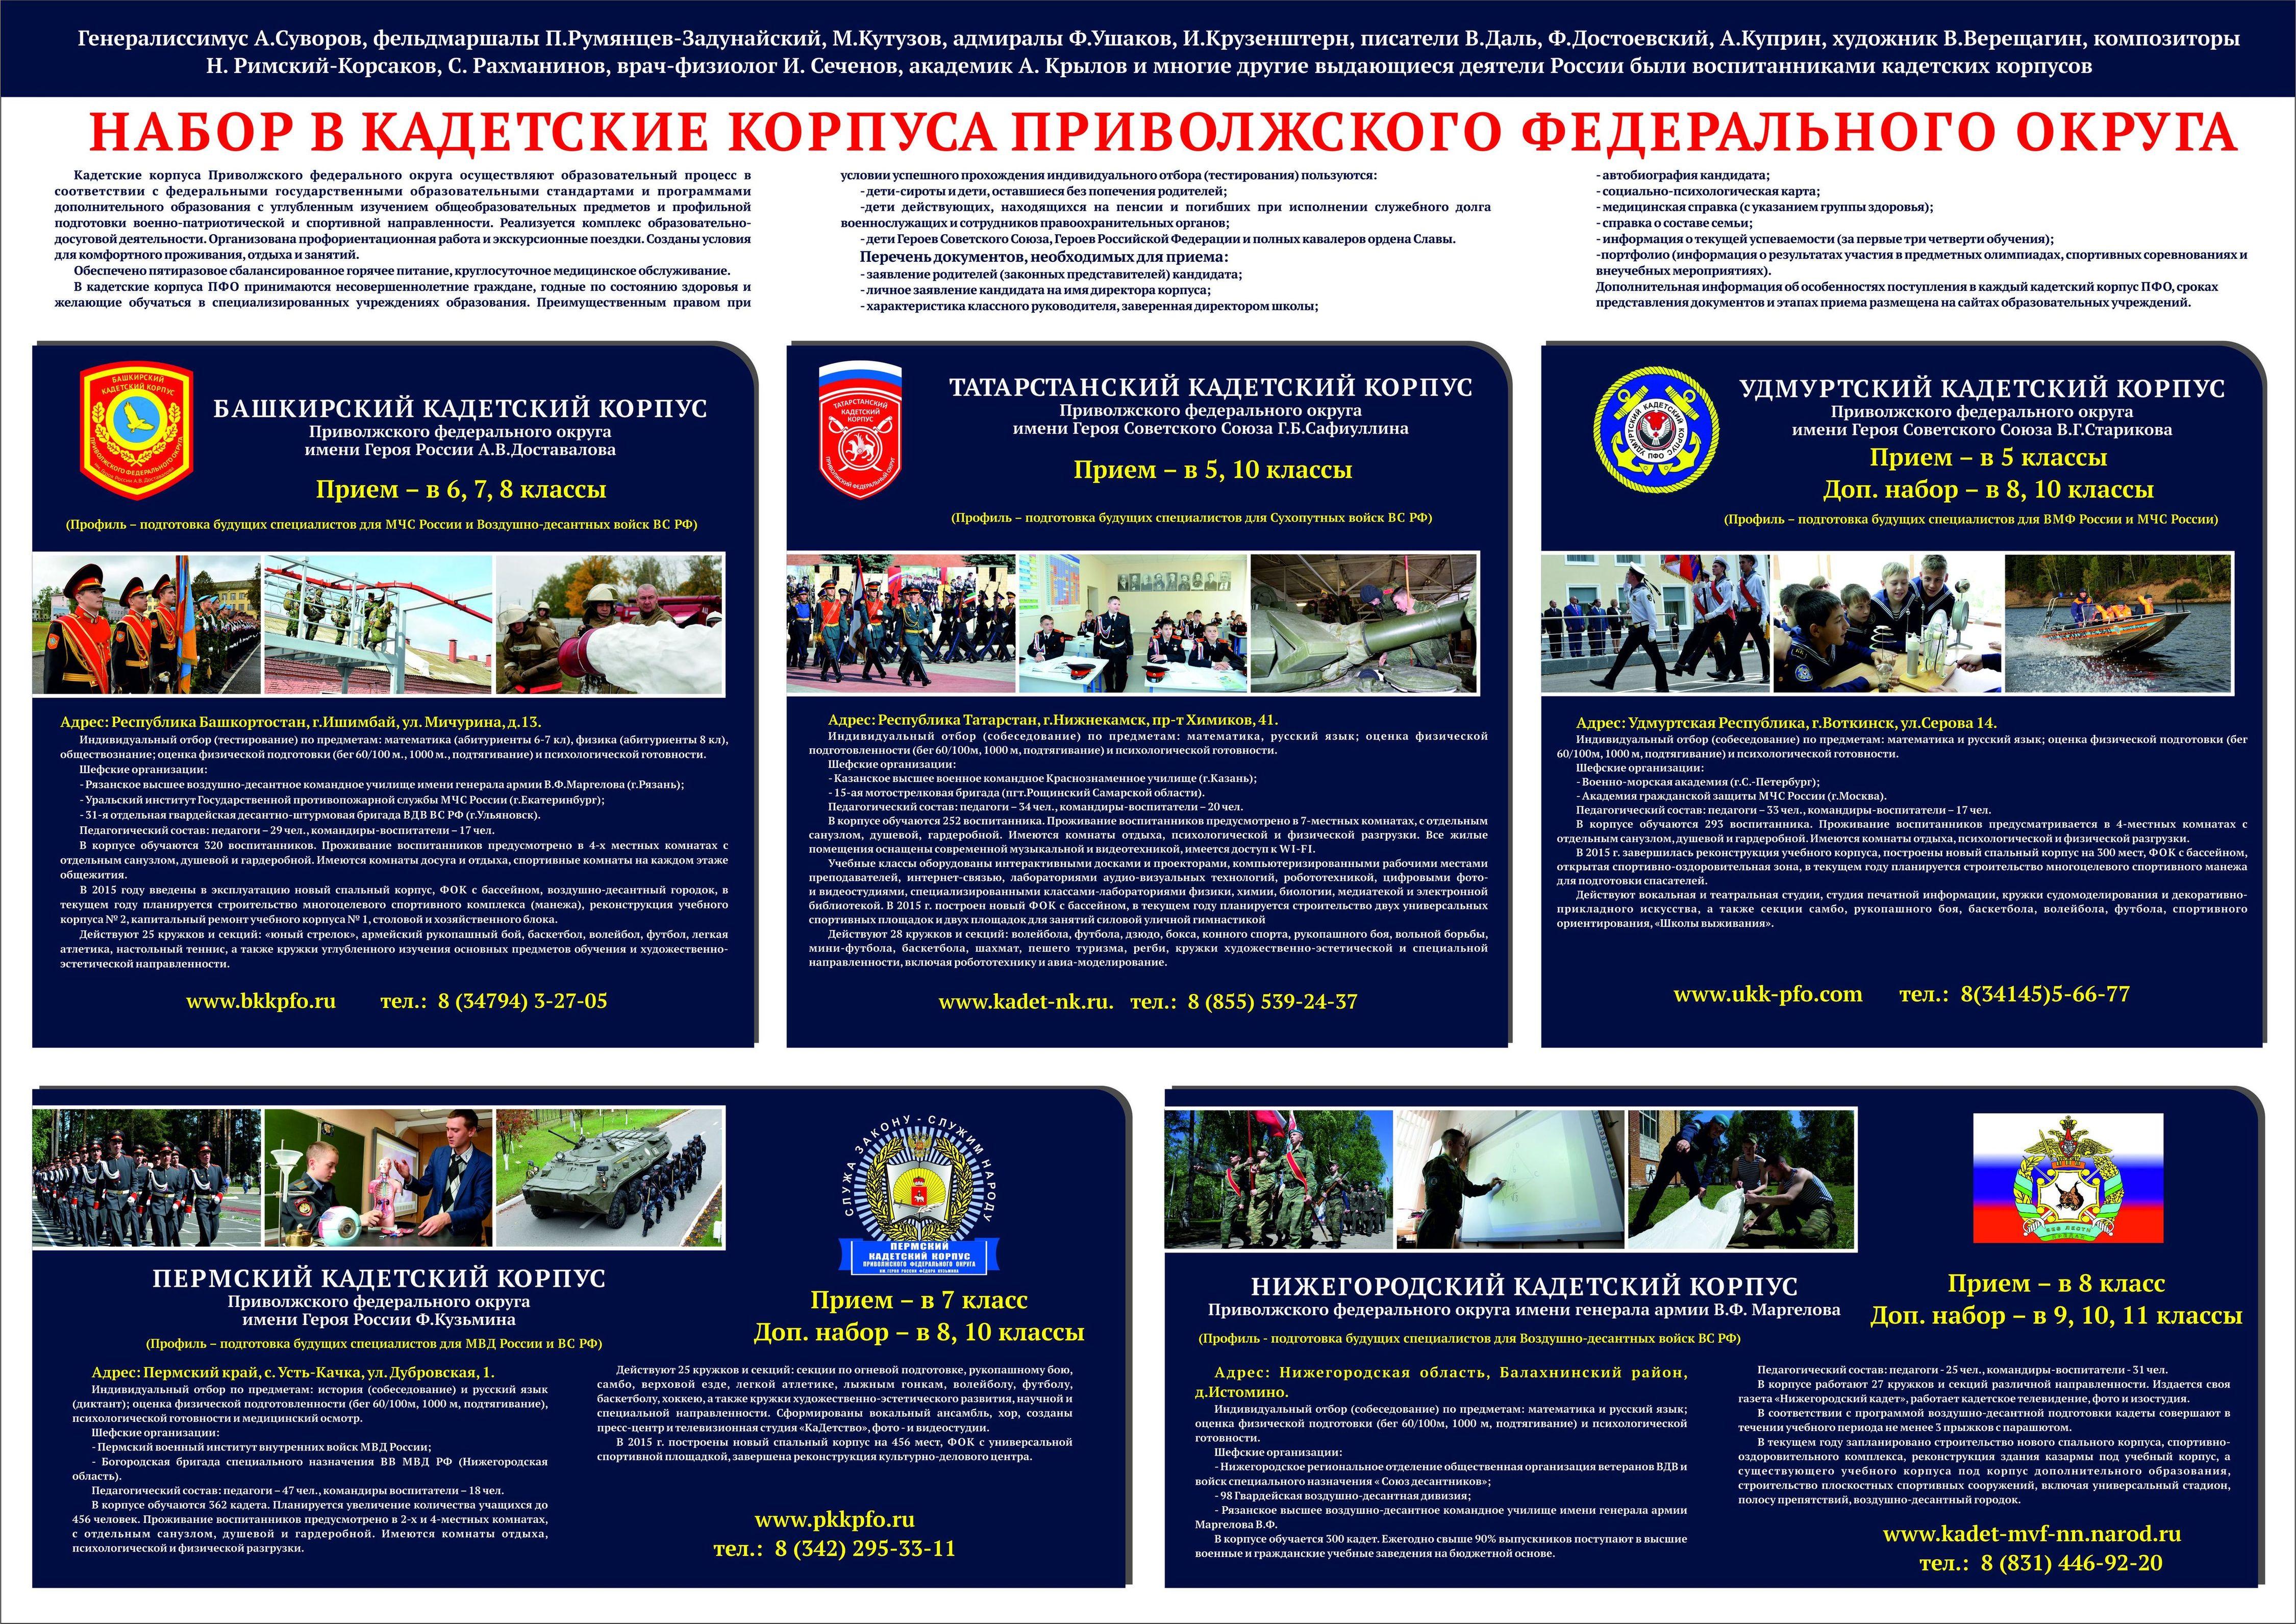 Совершенно голая заворотнюк, последние фото за сегодня: http://picmars.ru/sovershenno-golaya-zavorotnyuk.html